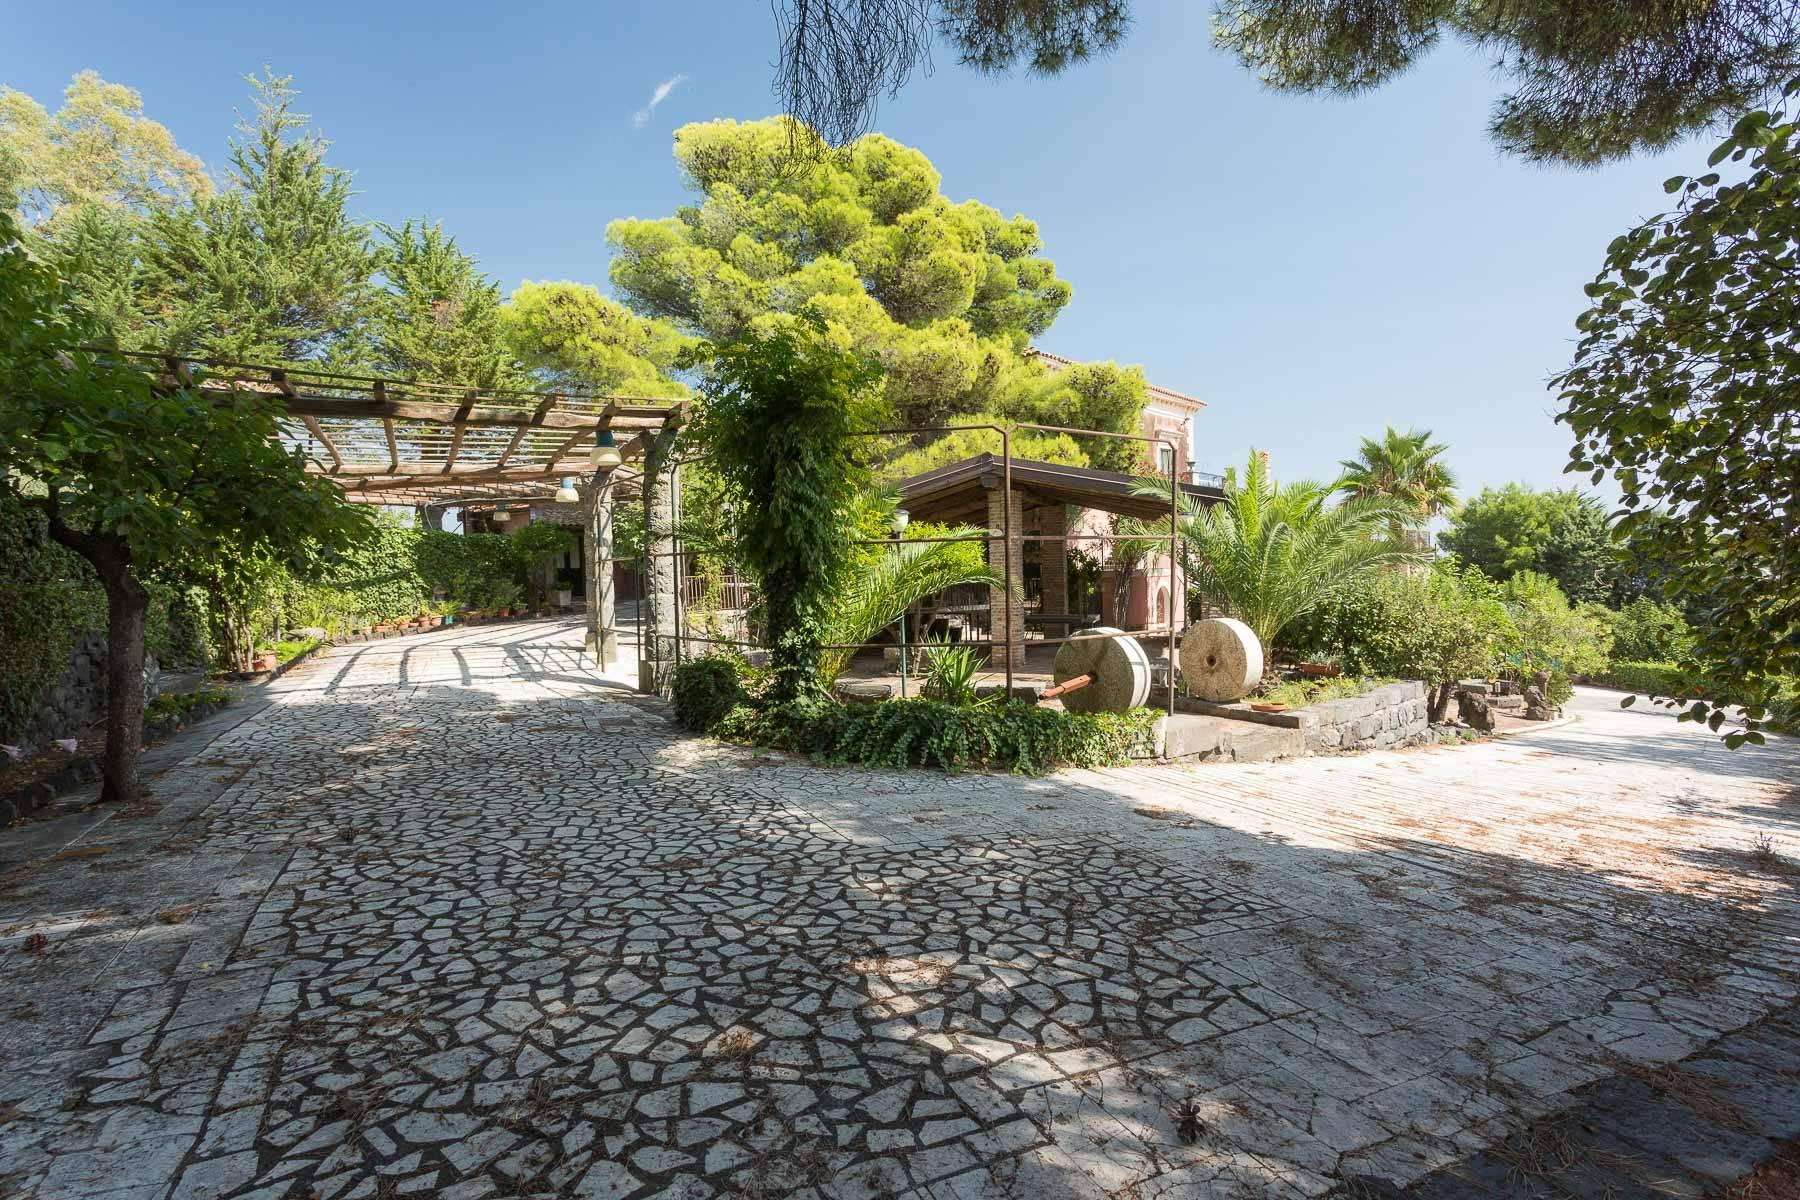 Magnifique Villa sur les pentes de l'Etna - 4